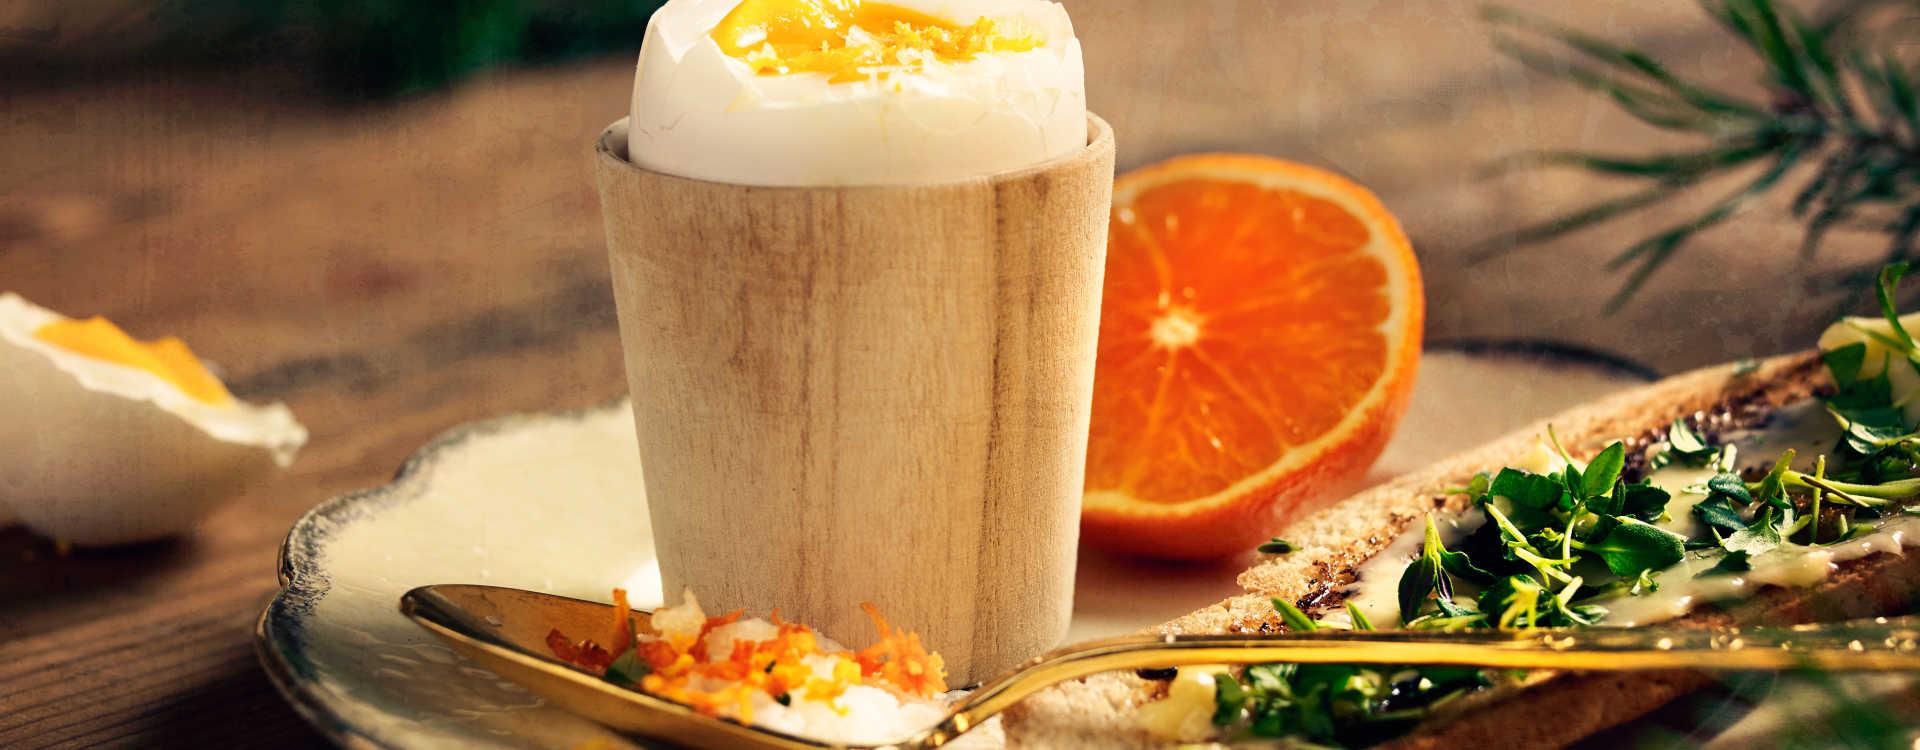 Appelsinegg med sprø toast